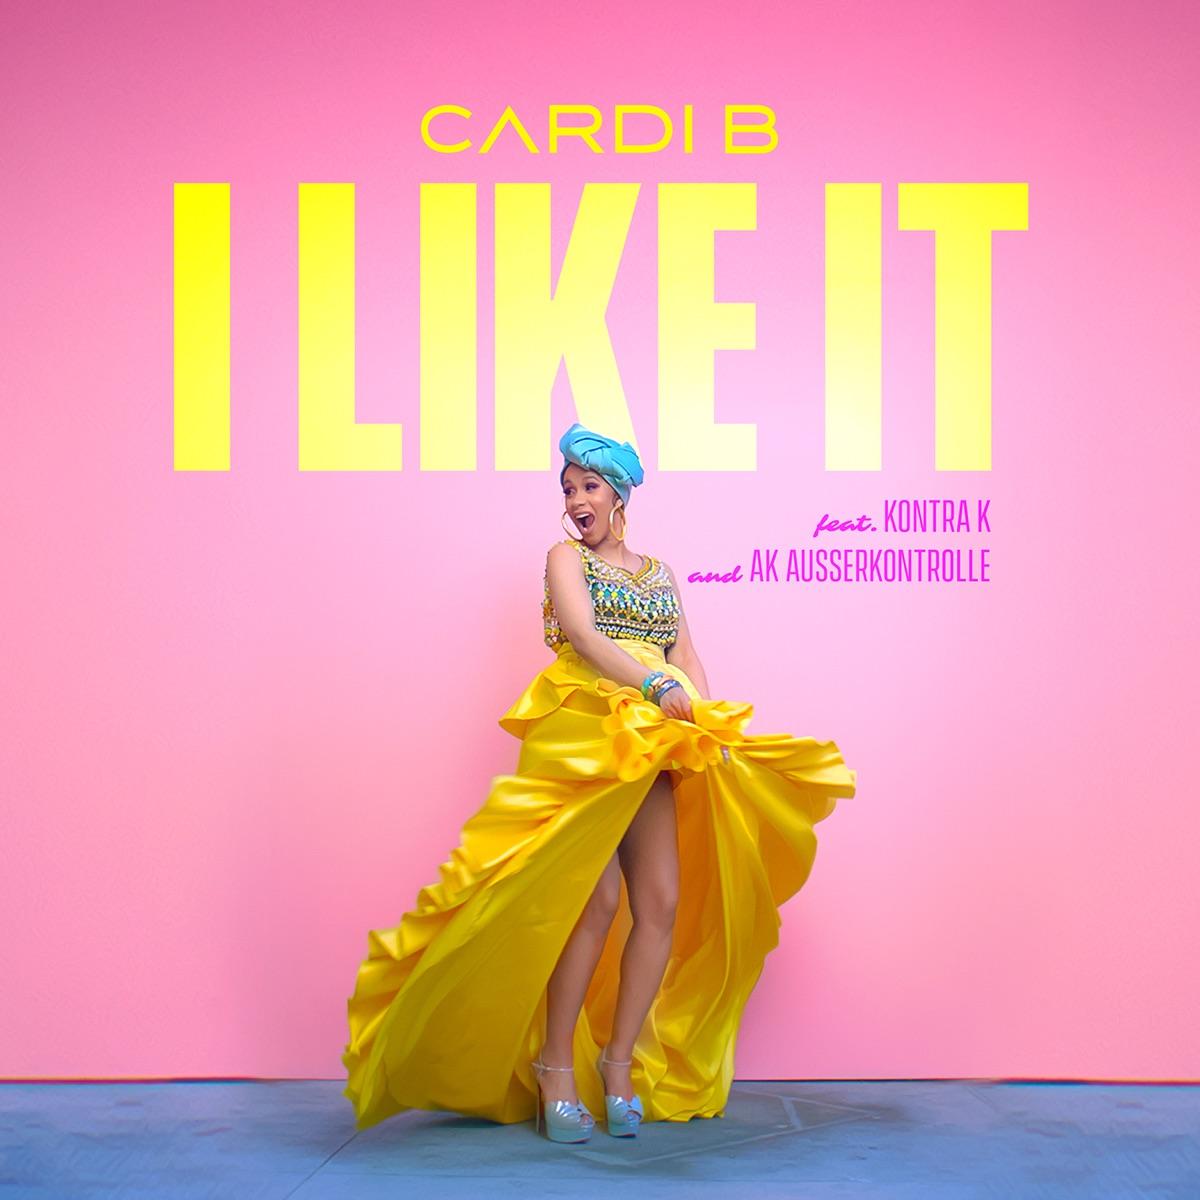 I Like It Album Cover By Cardi B